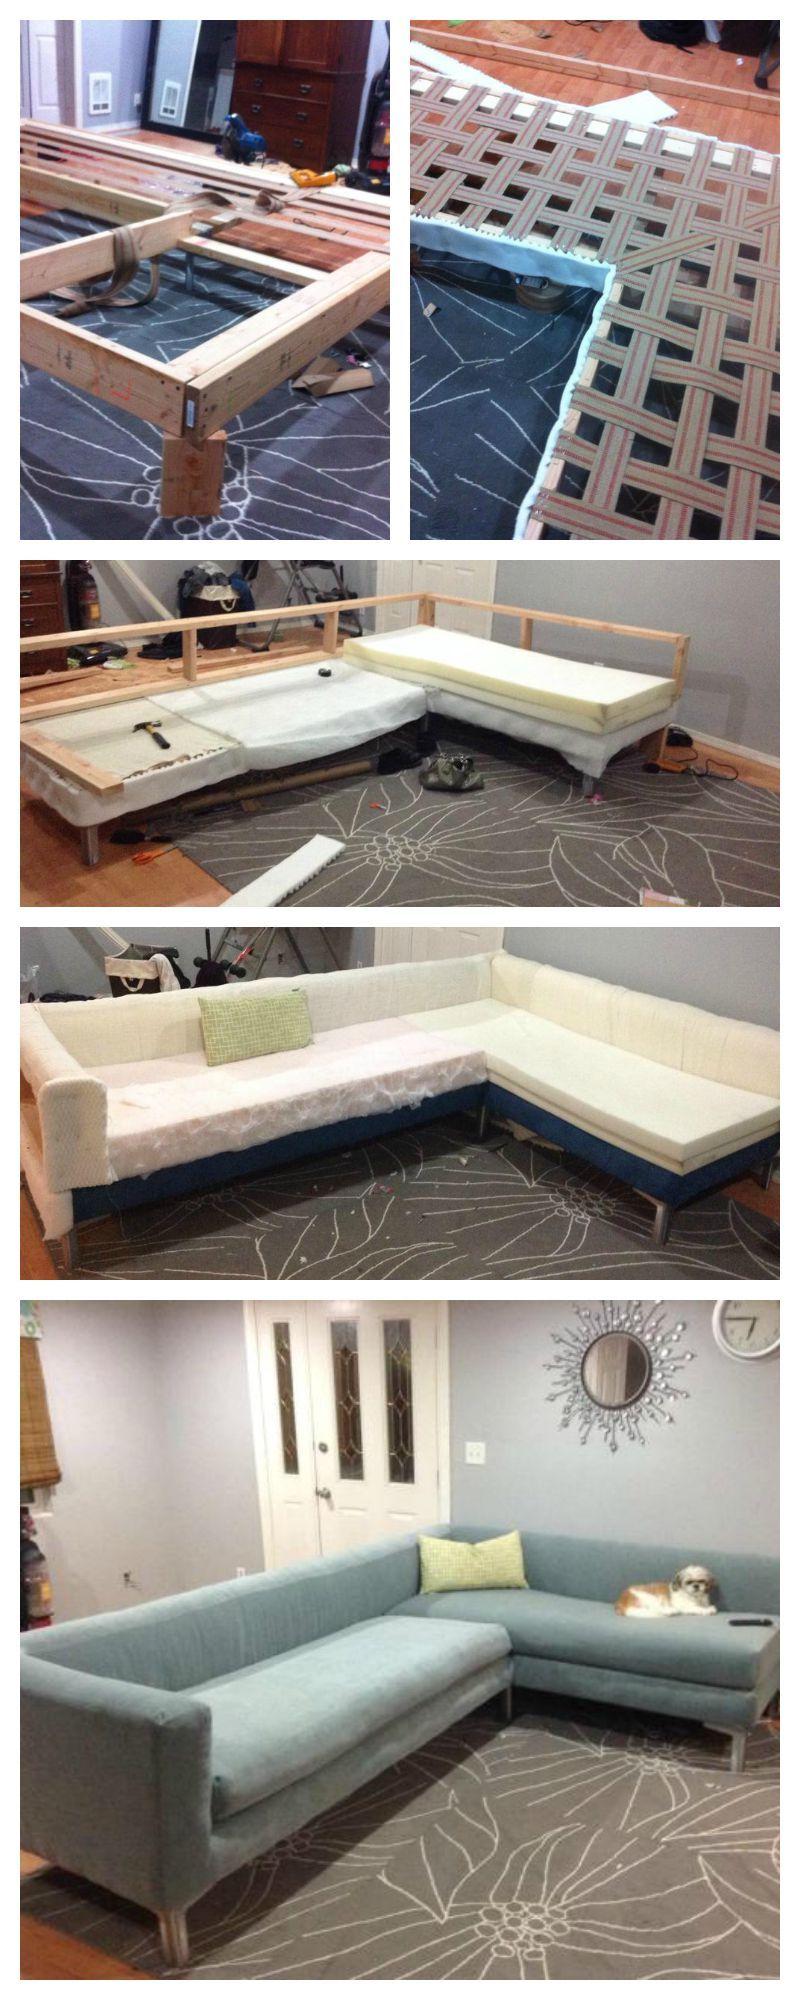 Modern Sectional Sofa Build Your Own Sofa Diy Sofa Diy Couch